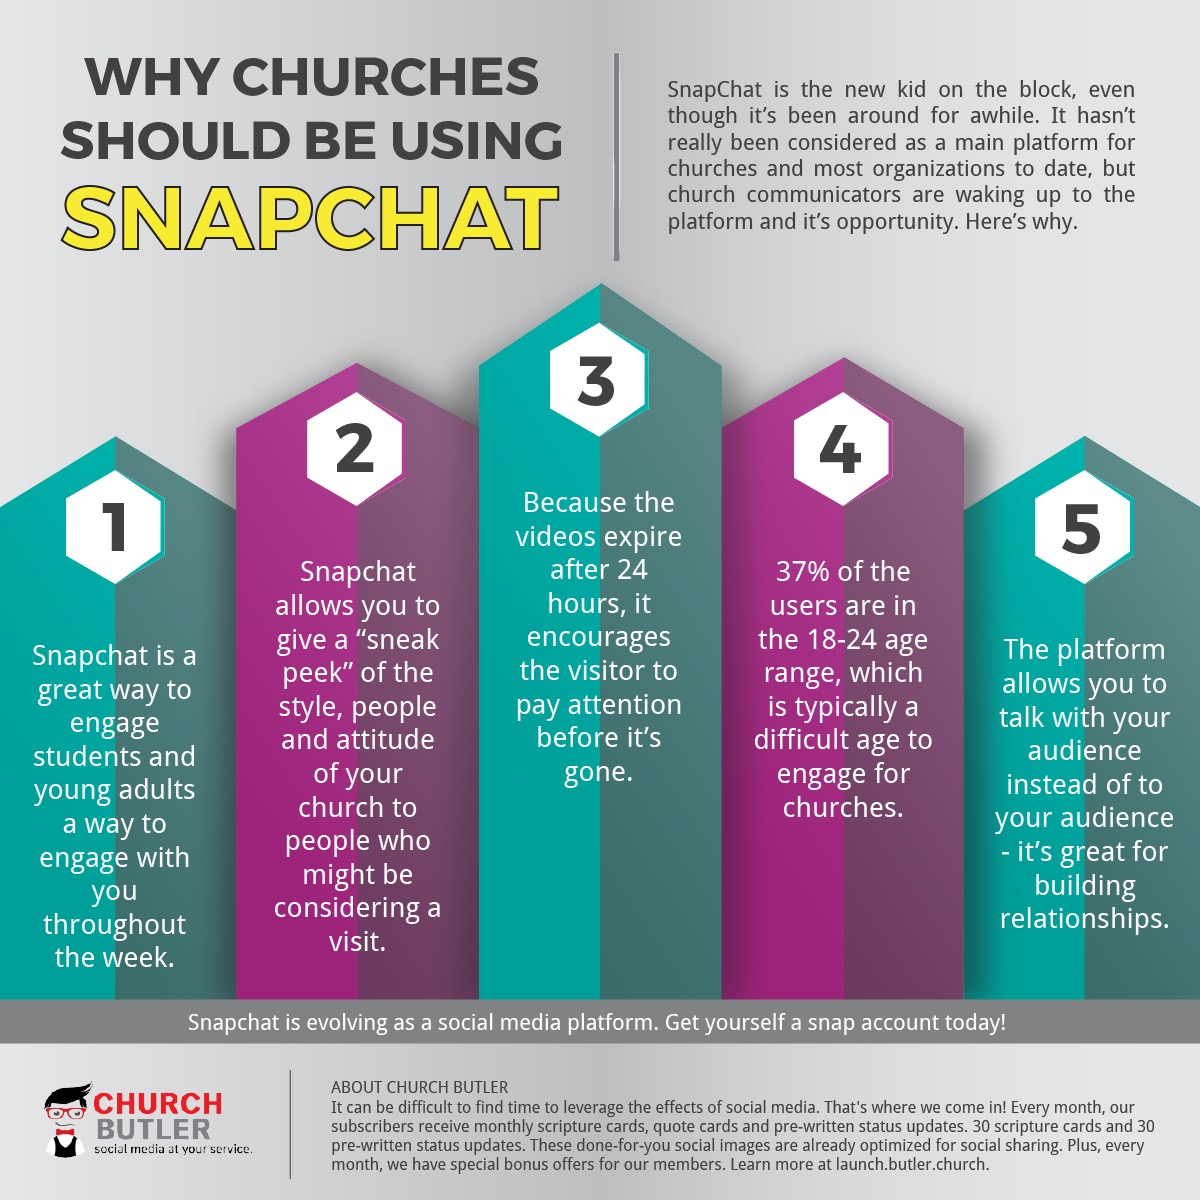 churches and SnapChat